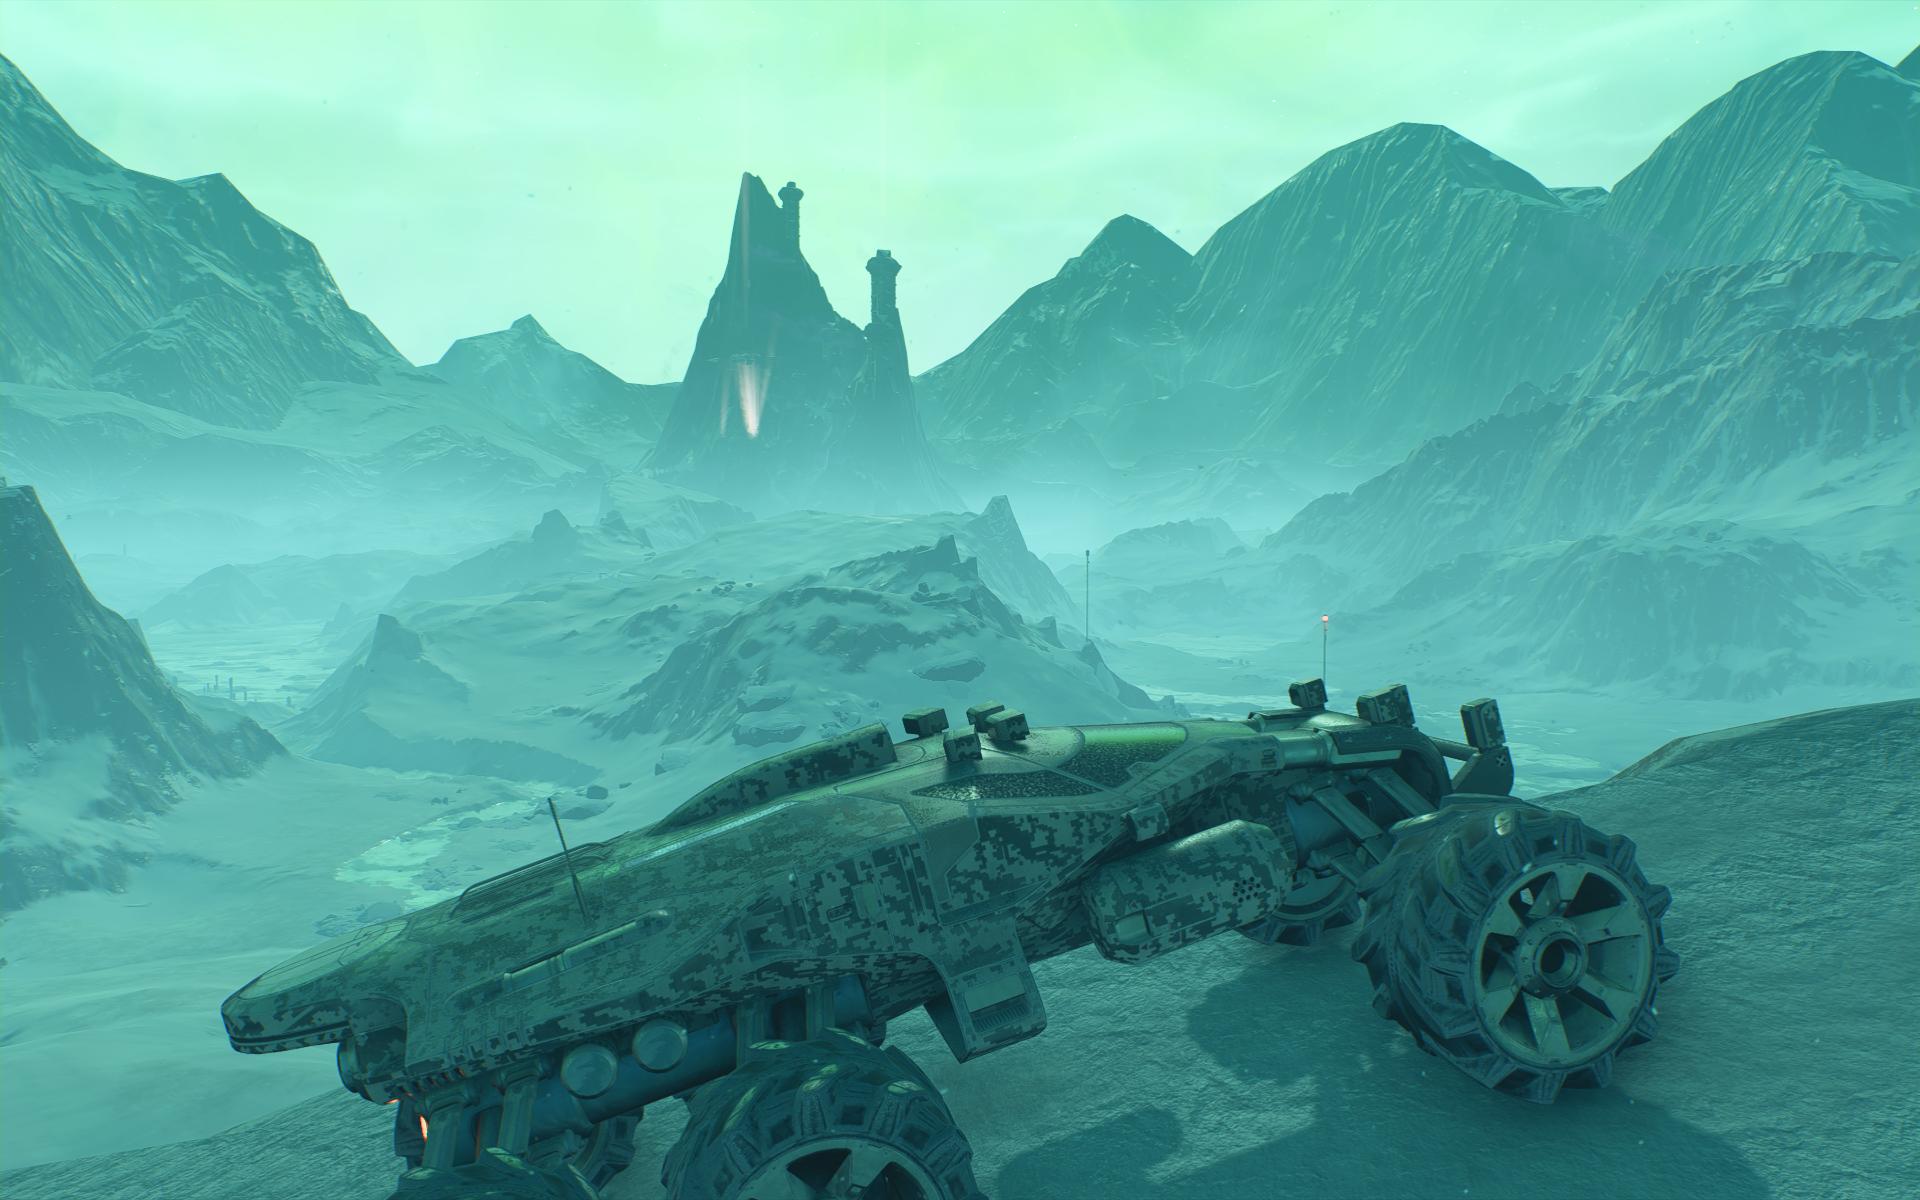 Mass Effect Andromeda Screenshot  - 15.30.32.69.png - Mass Effect: Andromeda